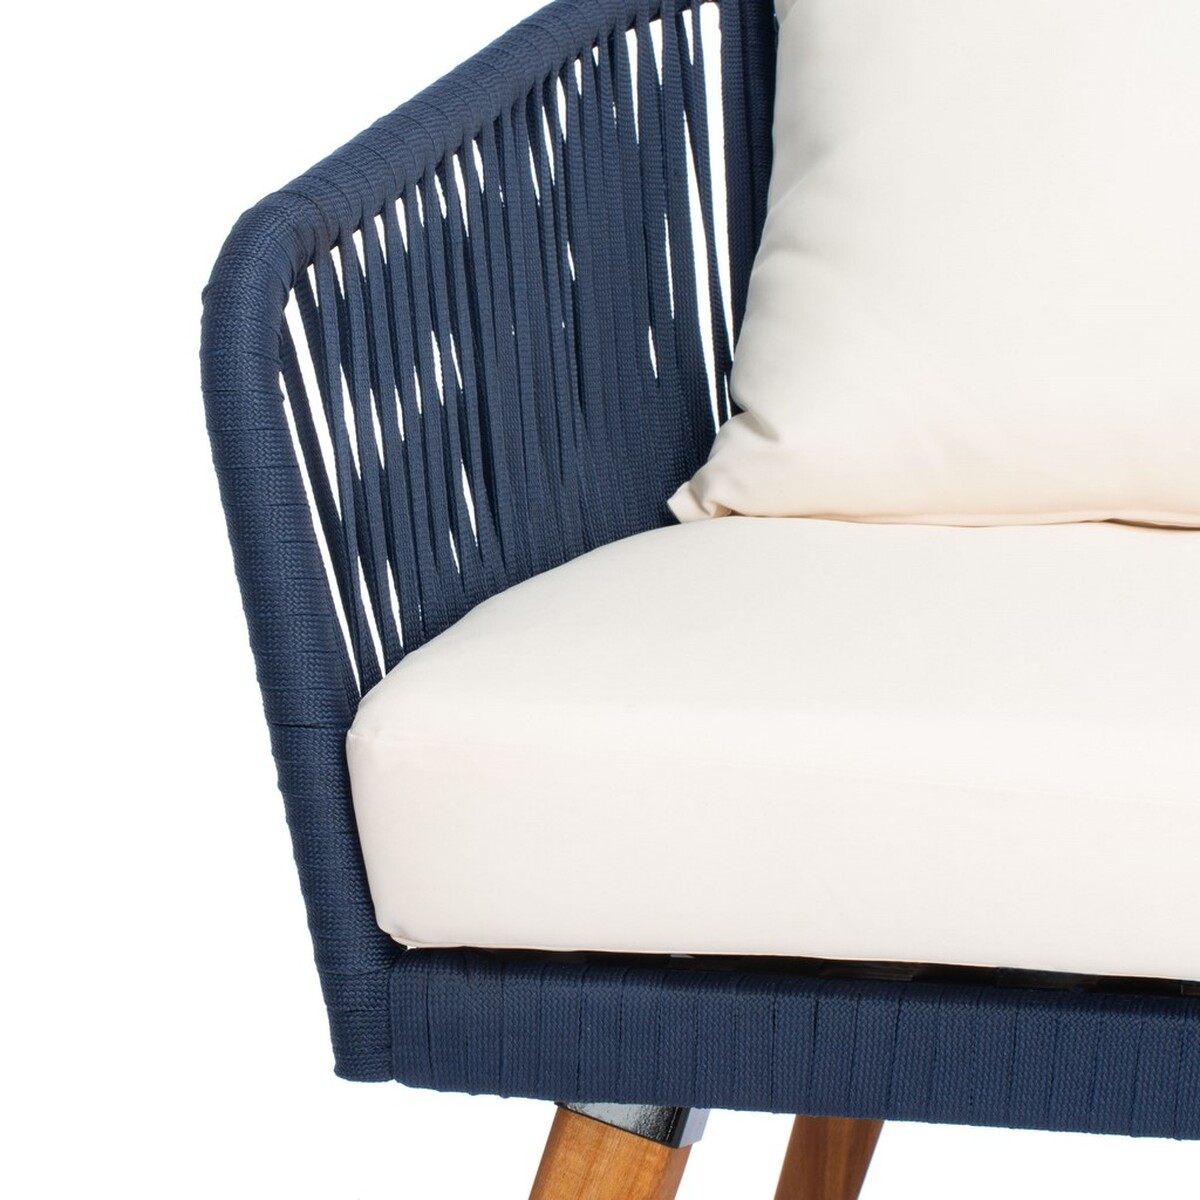 PAT7074E Patio Sets - 4 Piece - Furniture by Safavieh on Safavieh Ransin id=94510